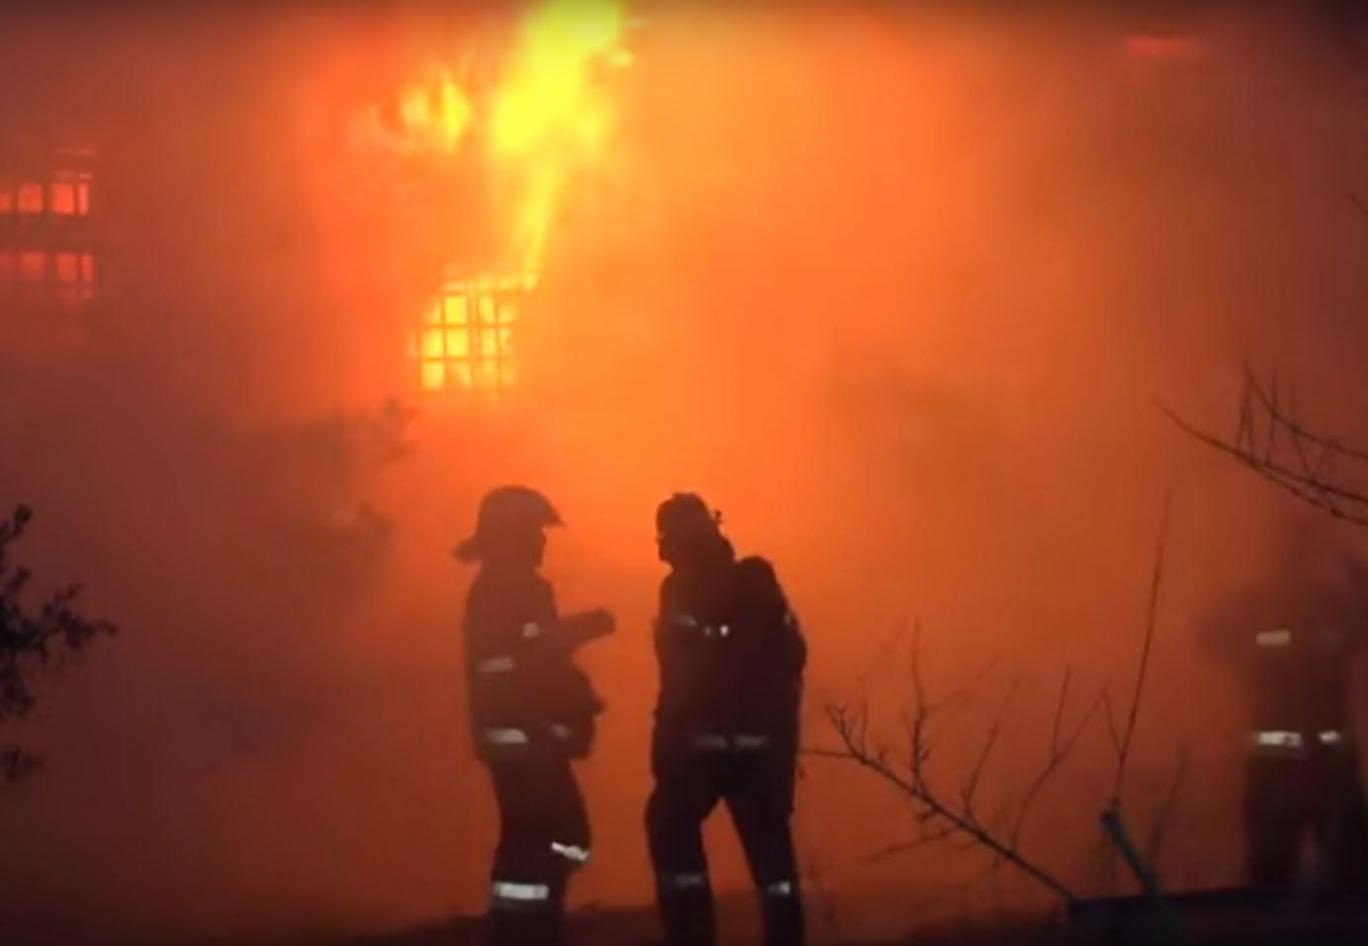 Dies of Azerbaijan Fire: Massive Blaze Kills 26 People At Drug Rehab Centre in Baku